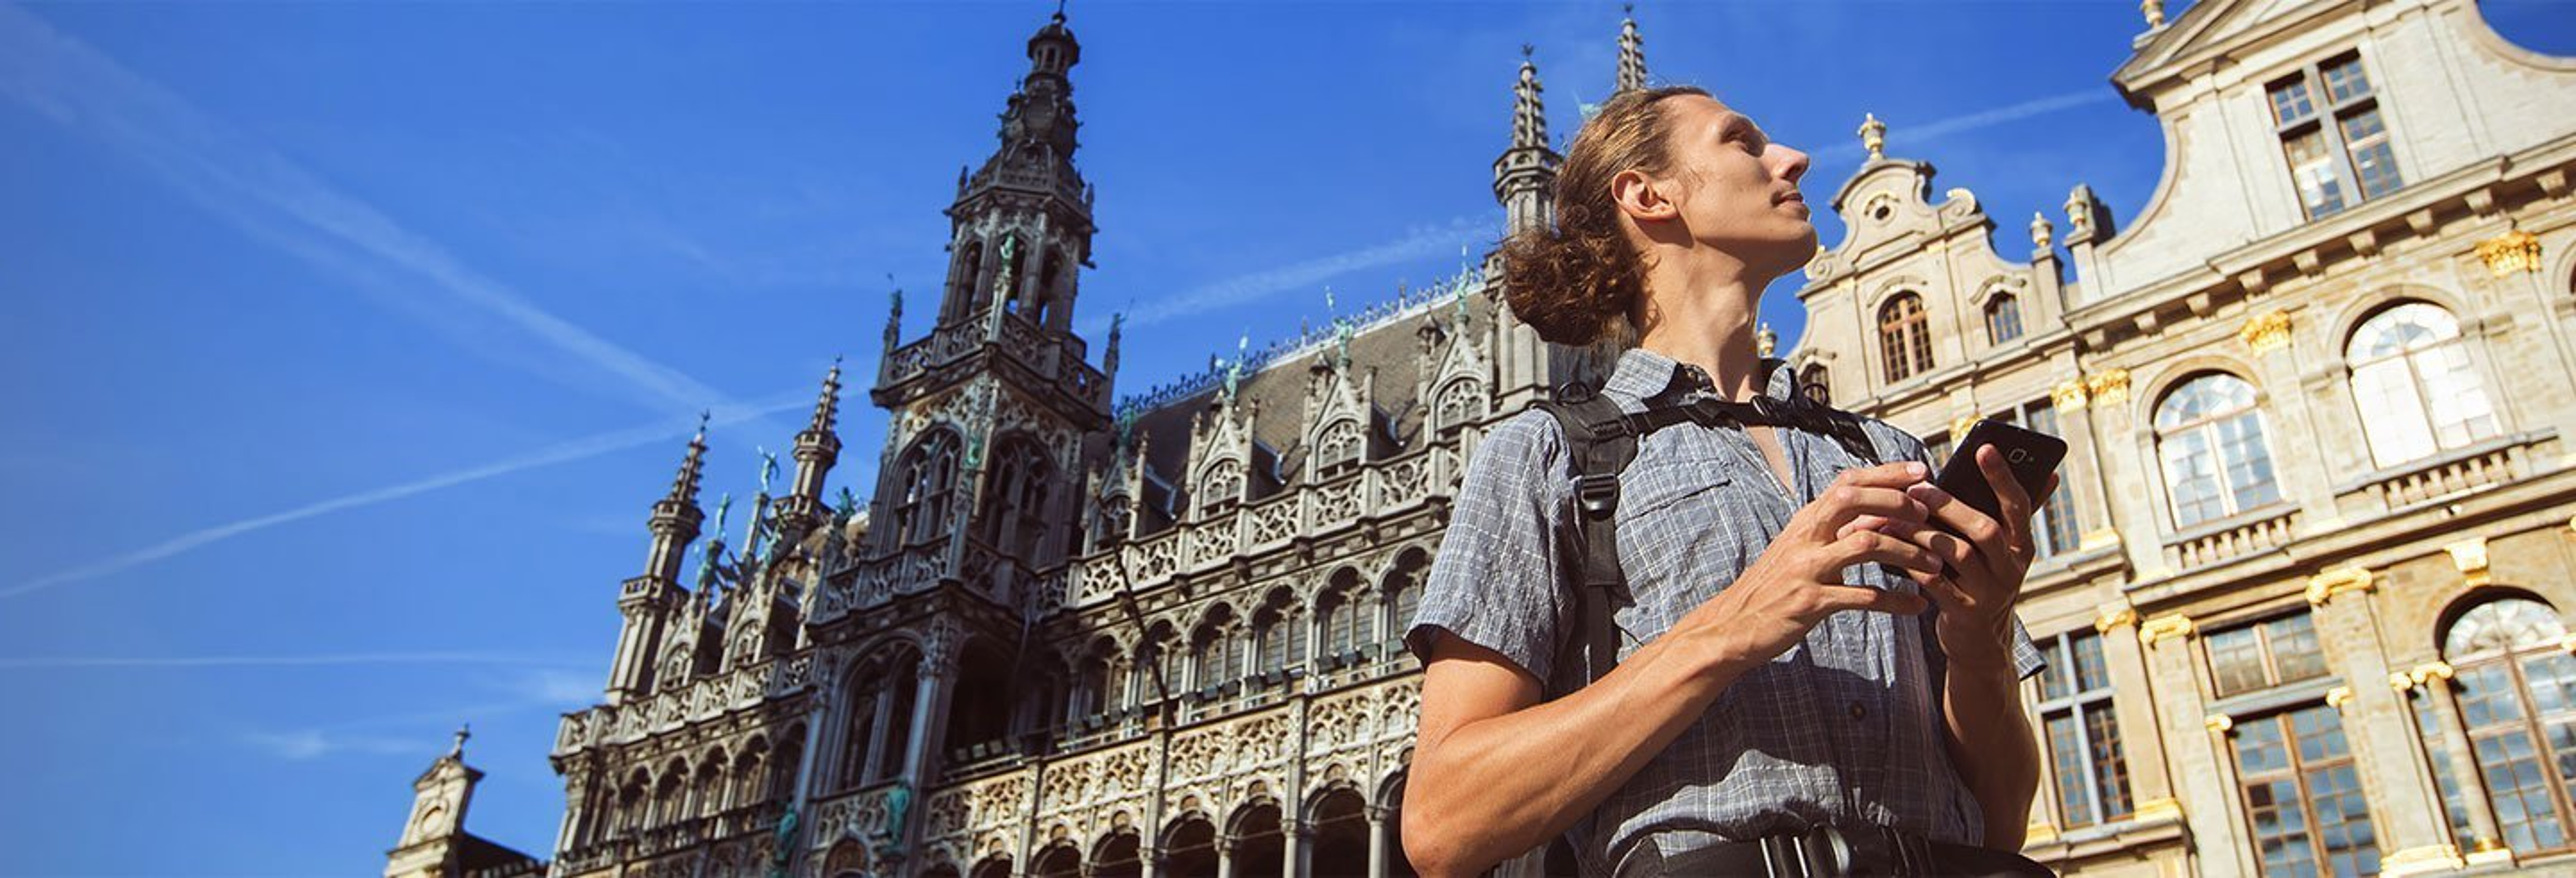 Free tour por el Barrio Europeo ¡Gratis!